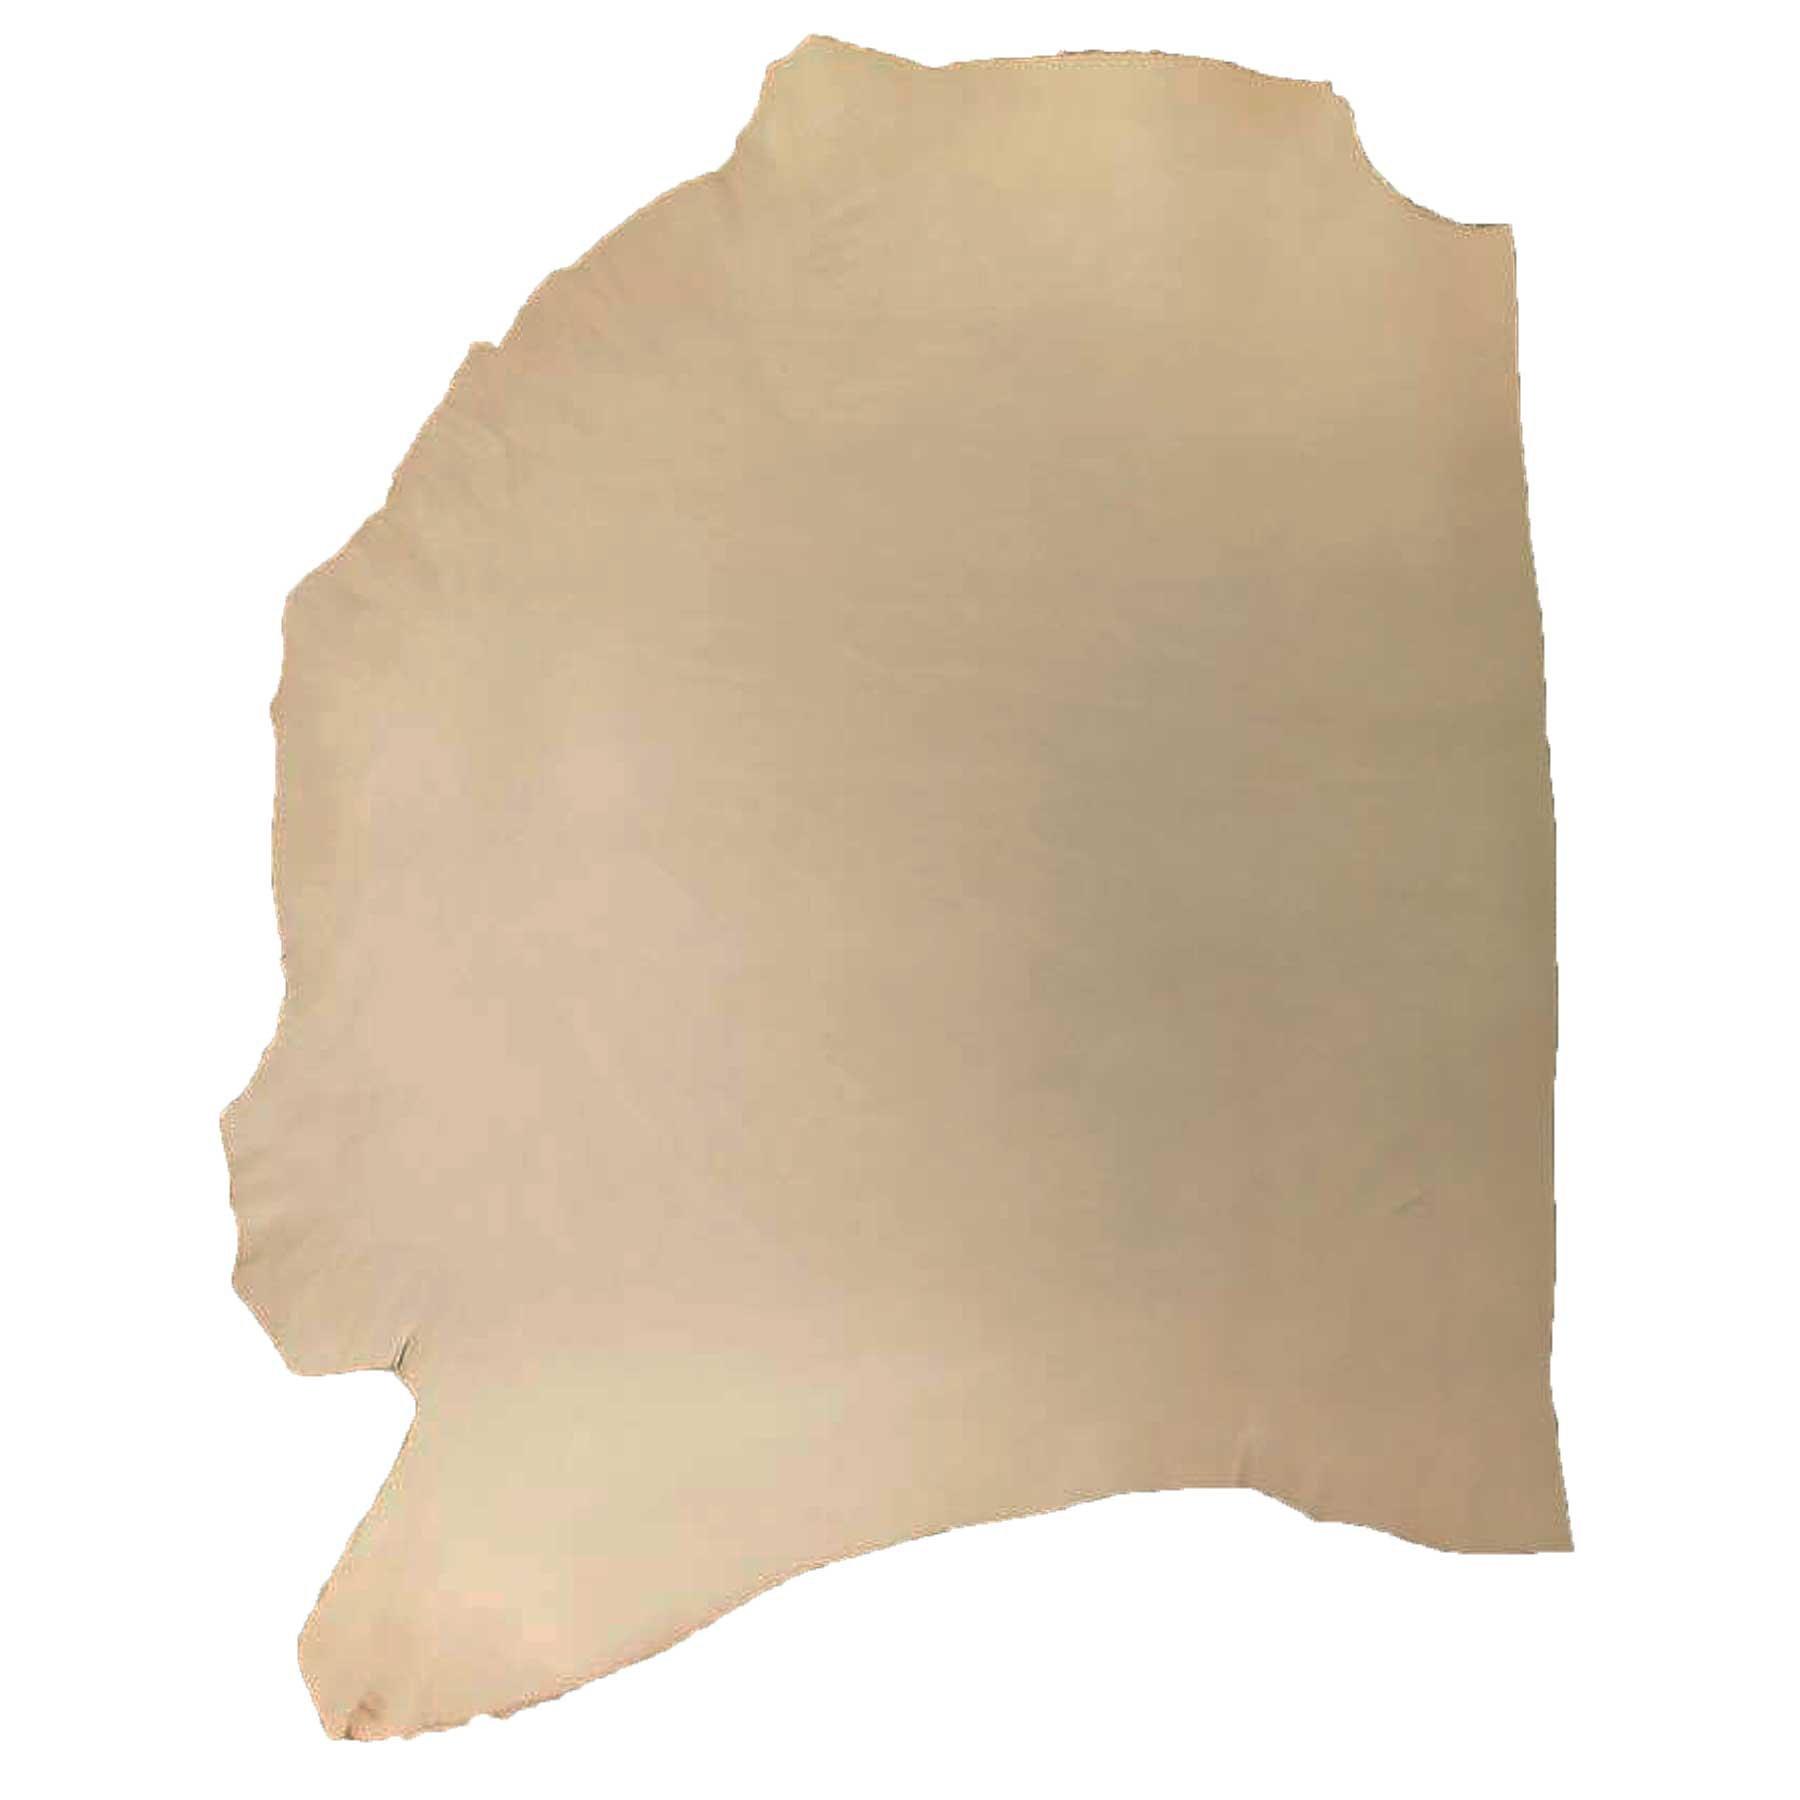 Genuine Vegetable Tan Cowhide Shoulder Natural 7-8oz Average 7-8 sqft Tooling Leather